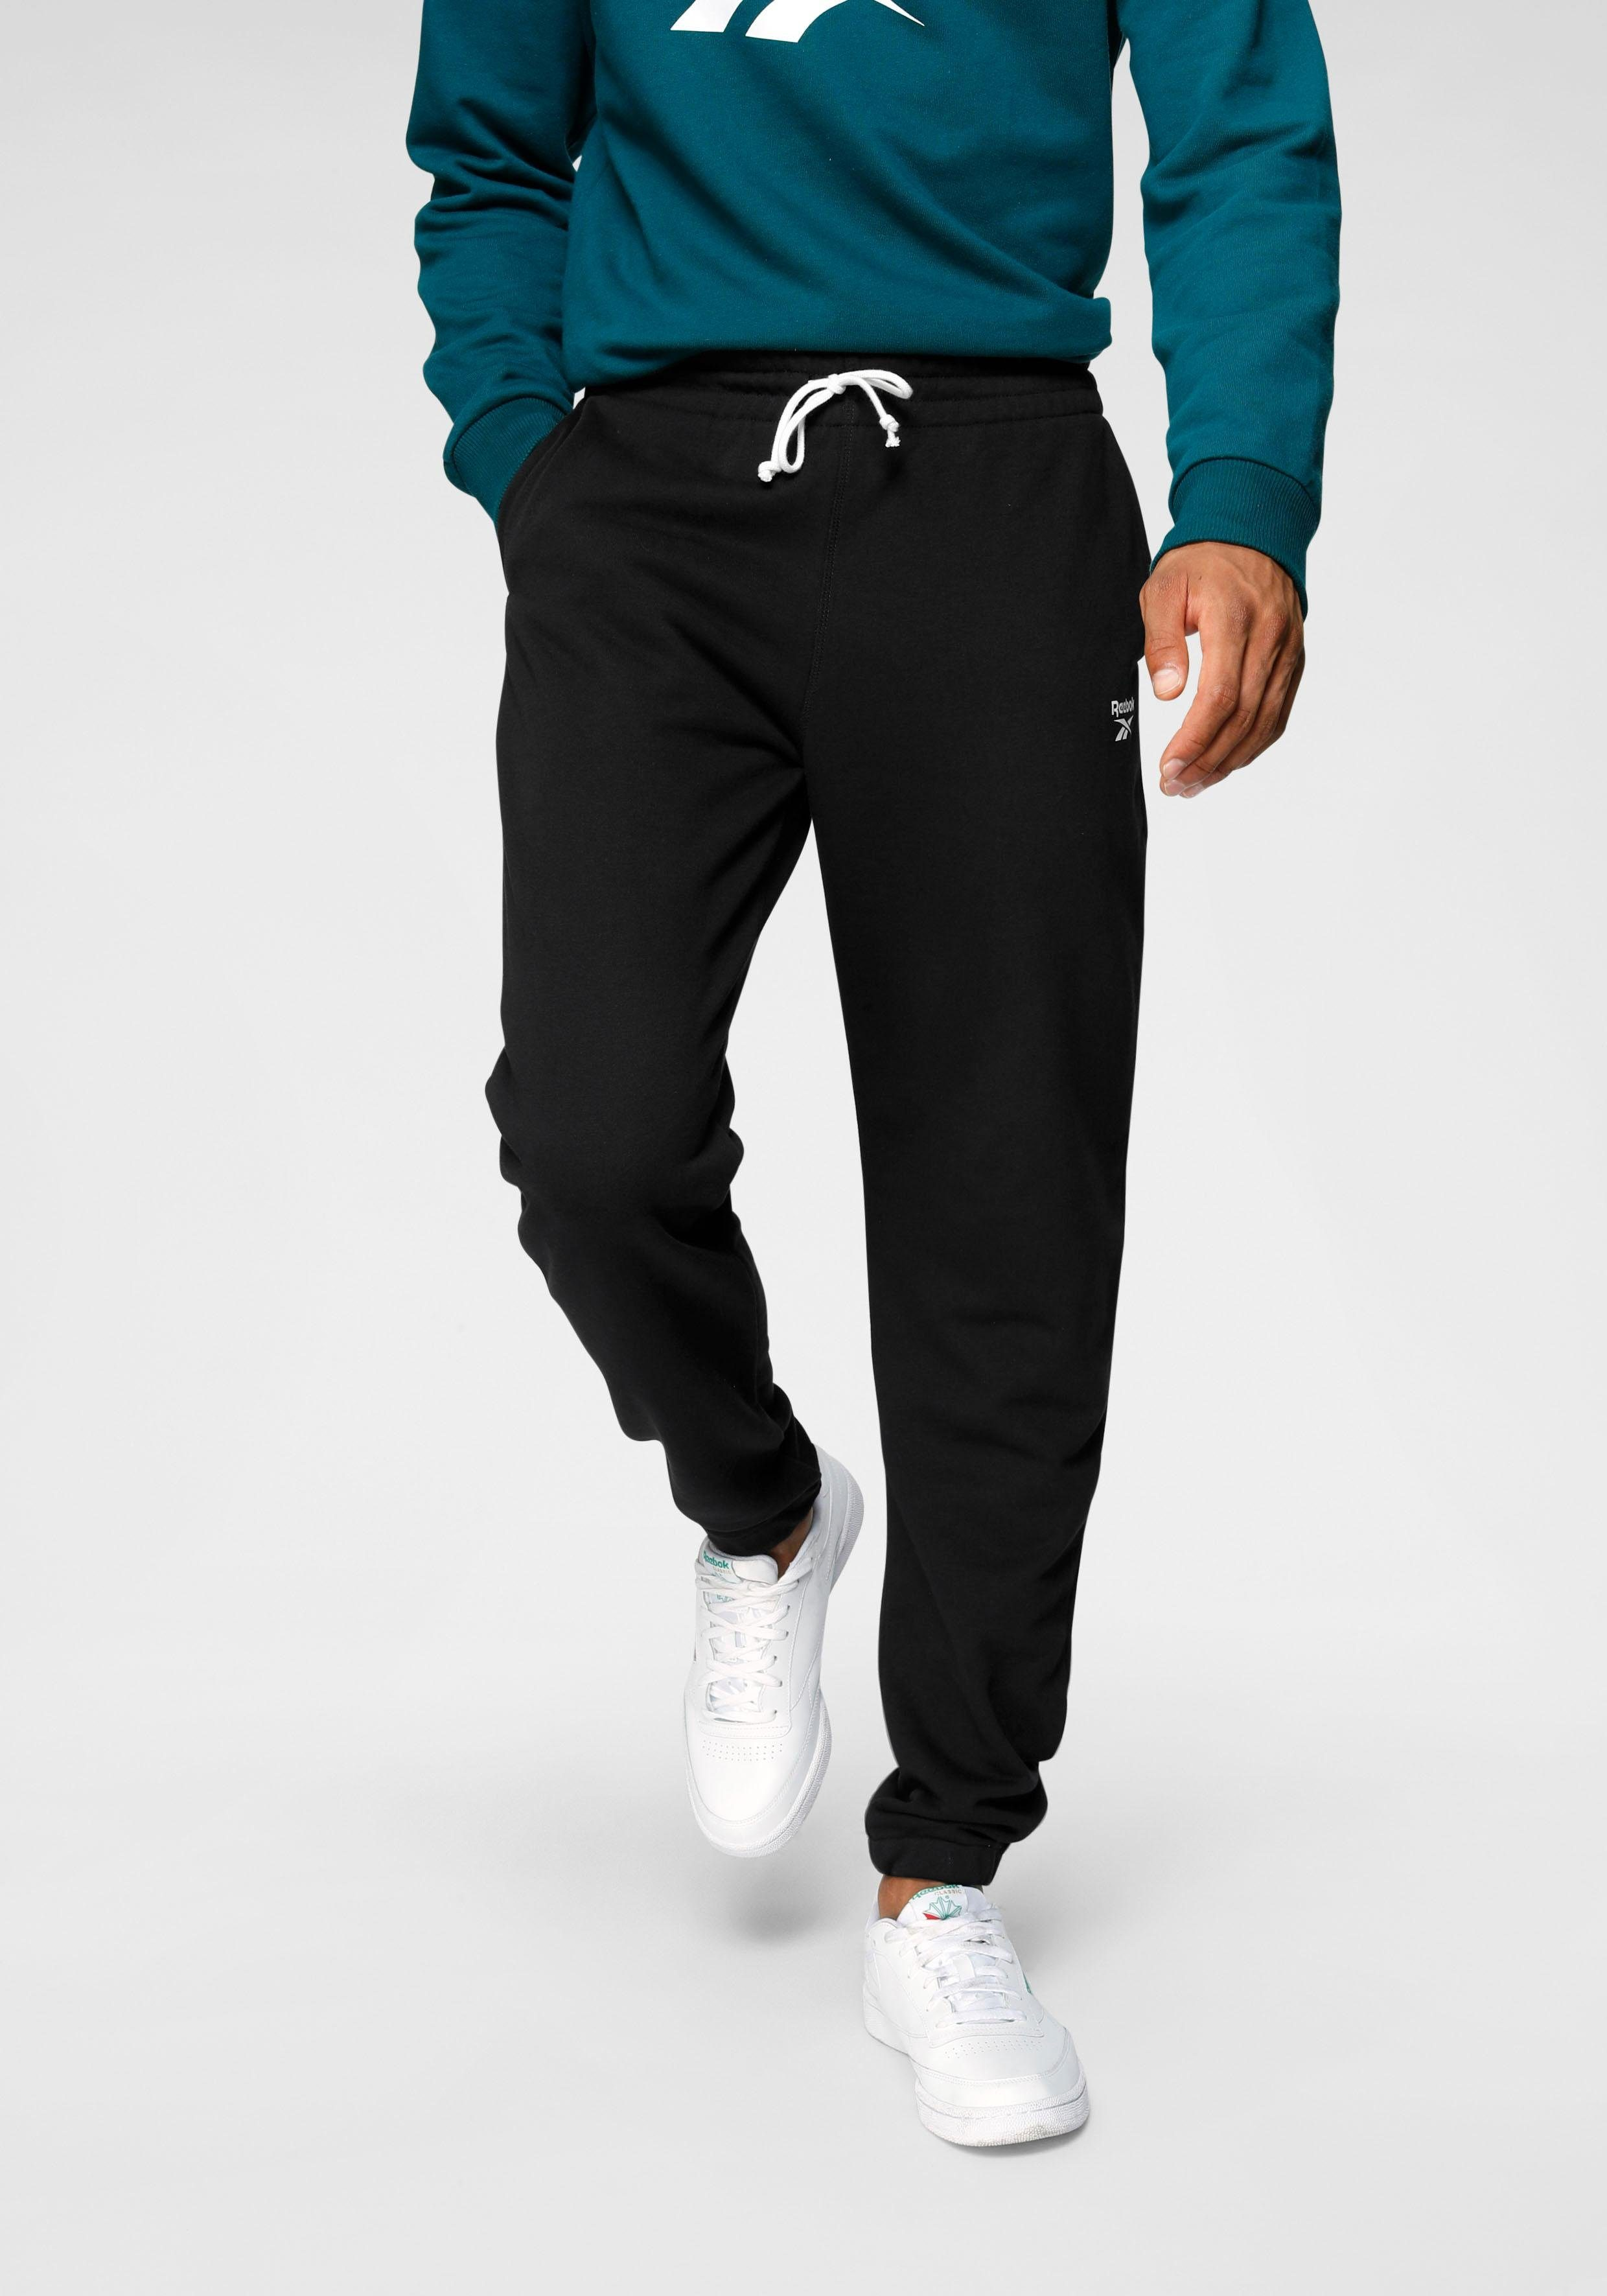 Reebok Jogginghose »TE FT CUFFED PANT«, Jogginghose von REEBOK online kaufen | OTTO